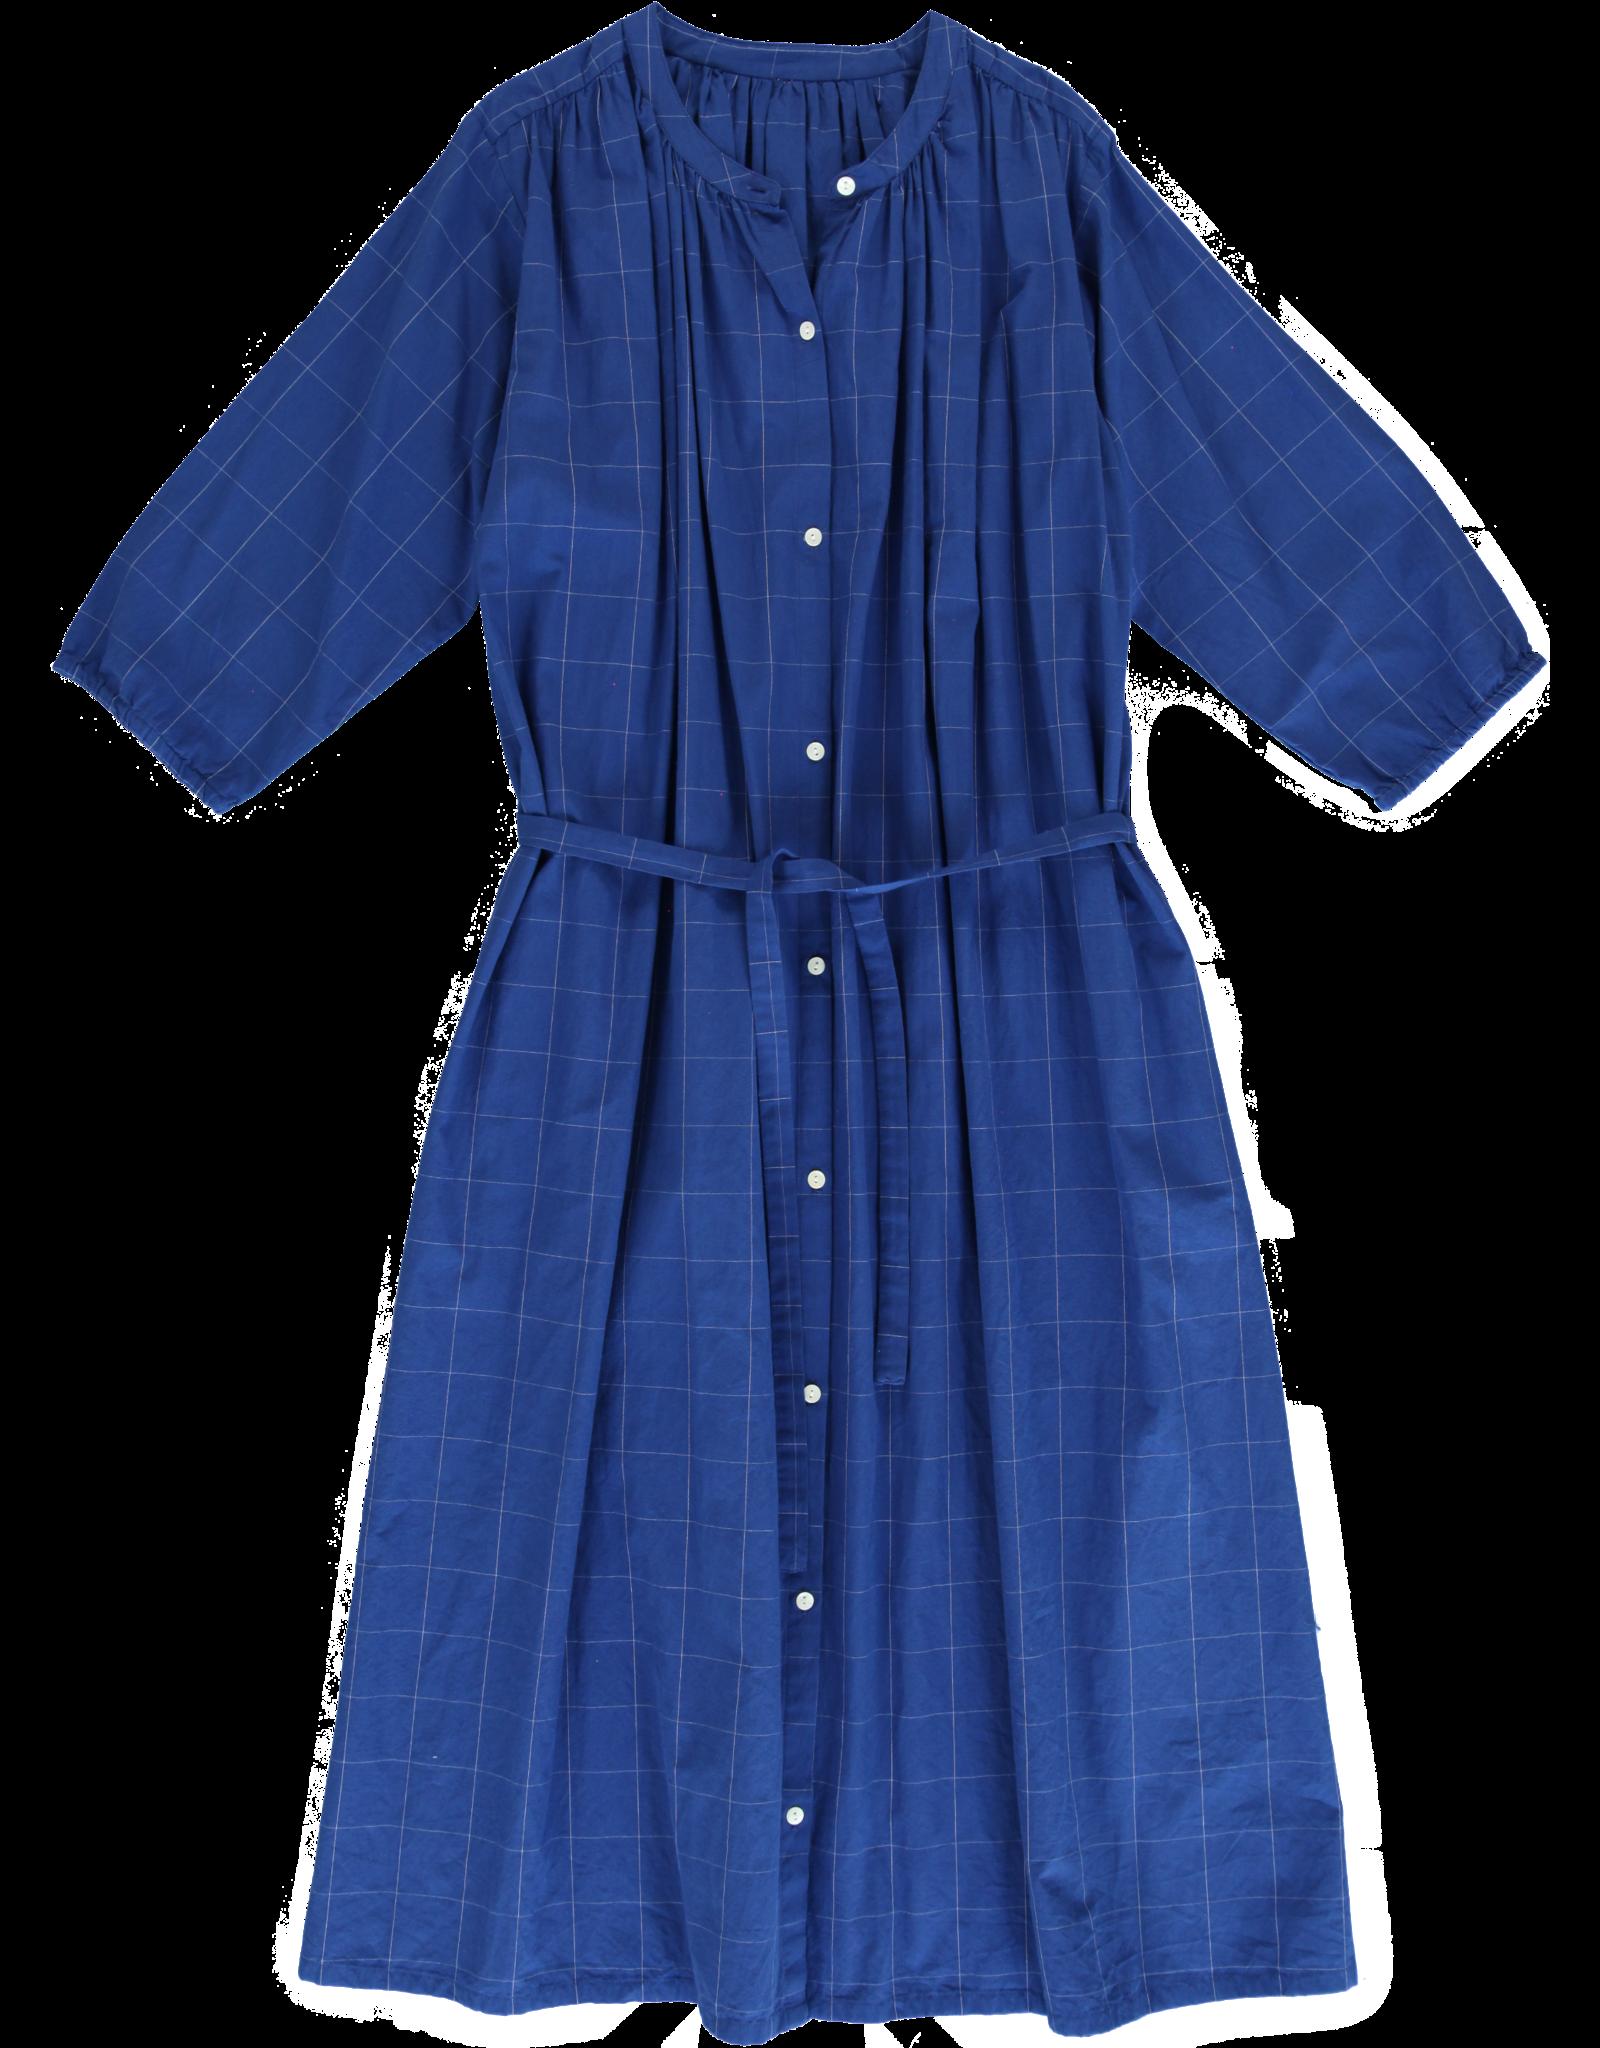 Dorélit Estrella | Nightdress | Check Blue